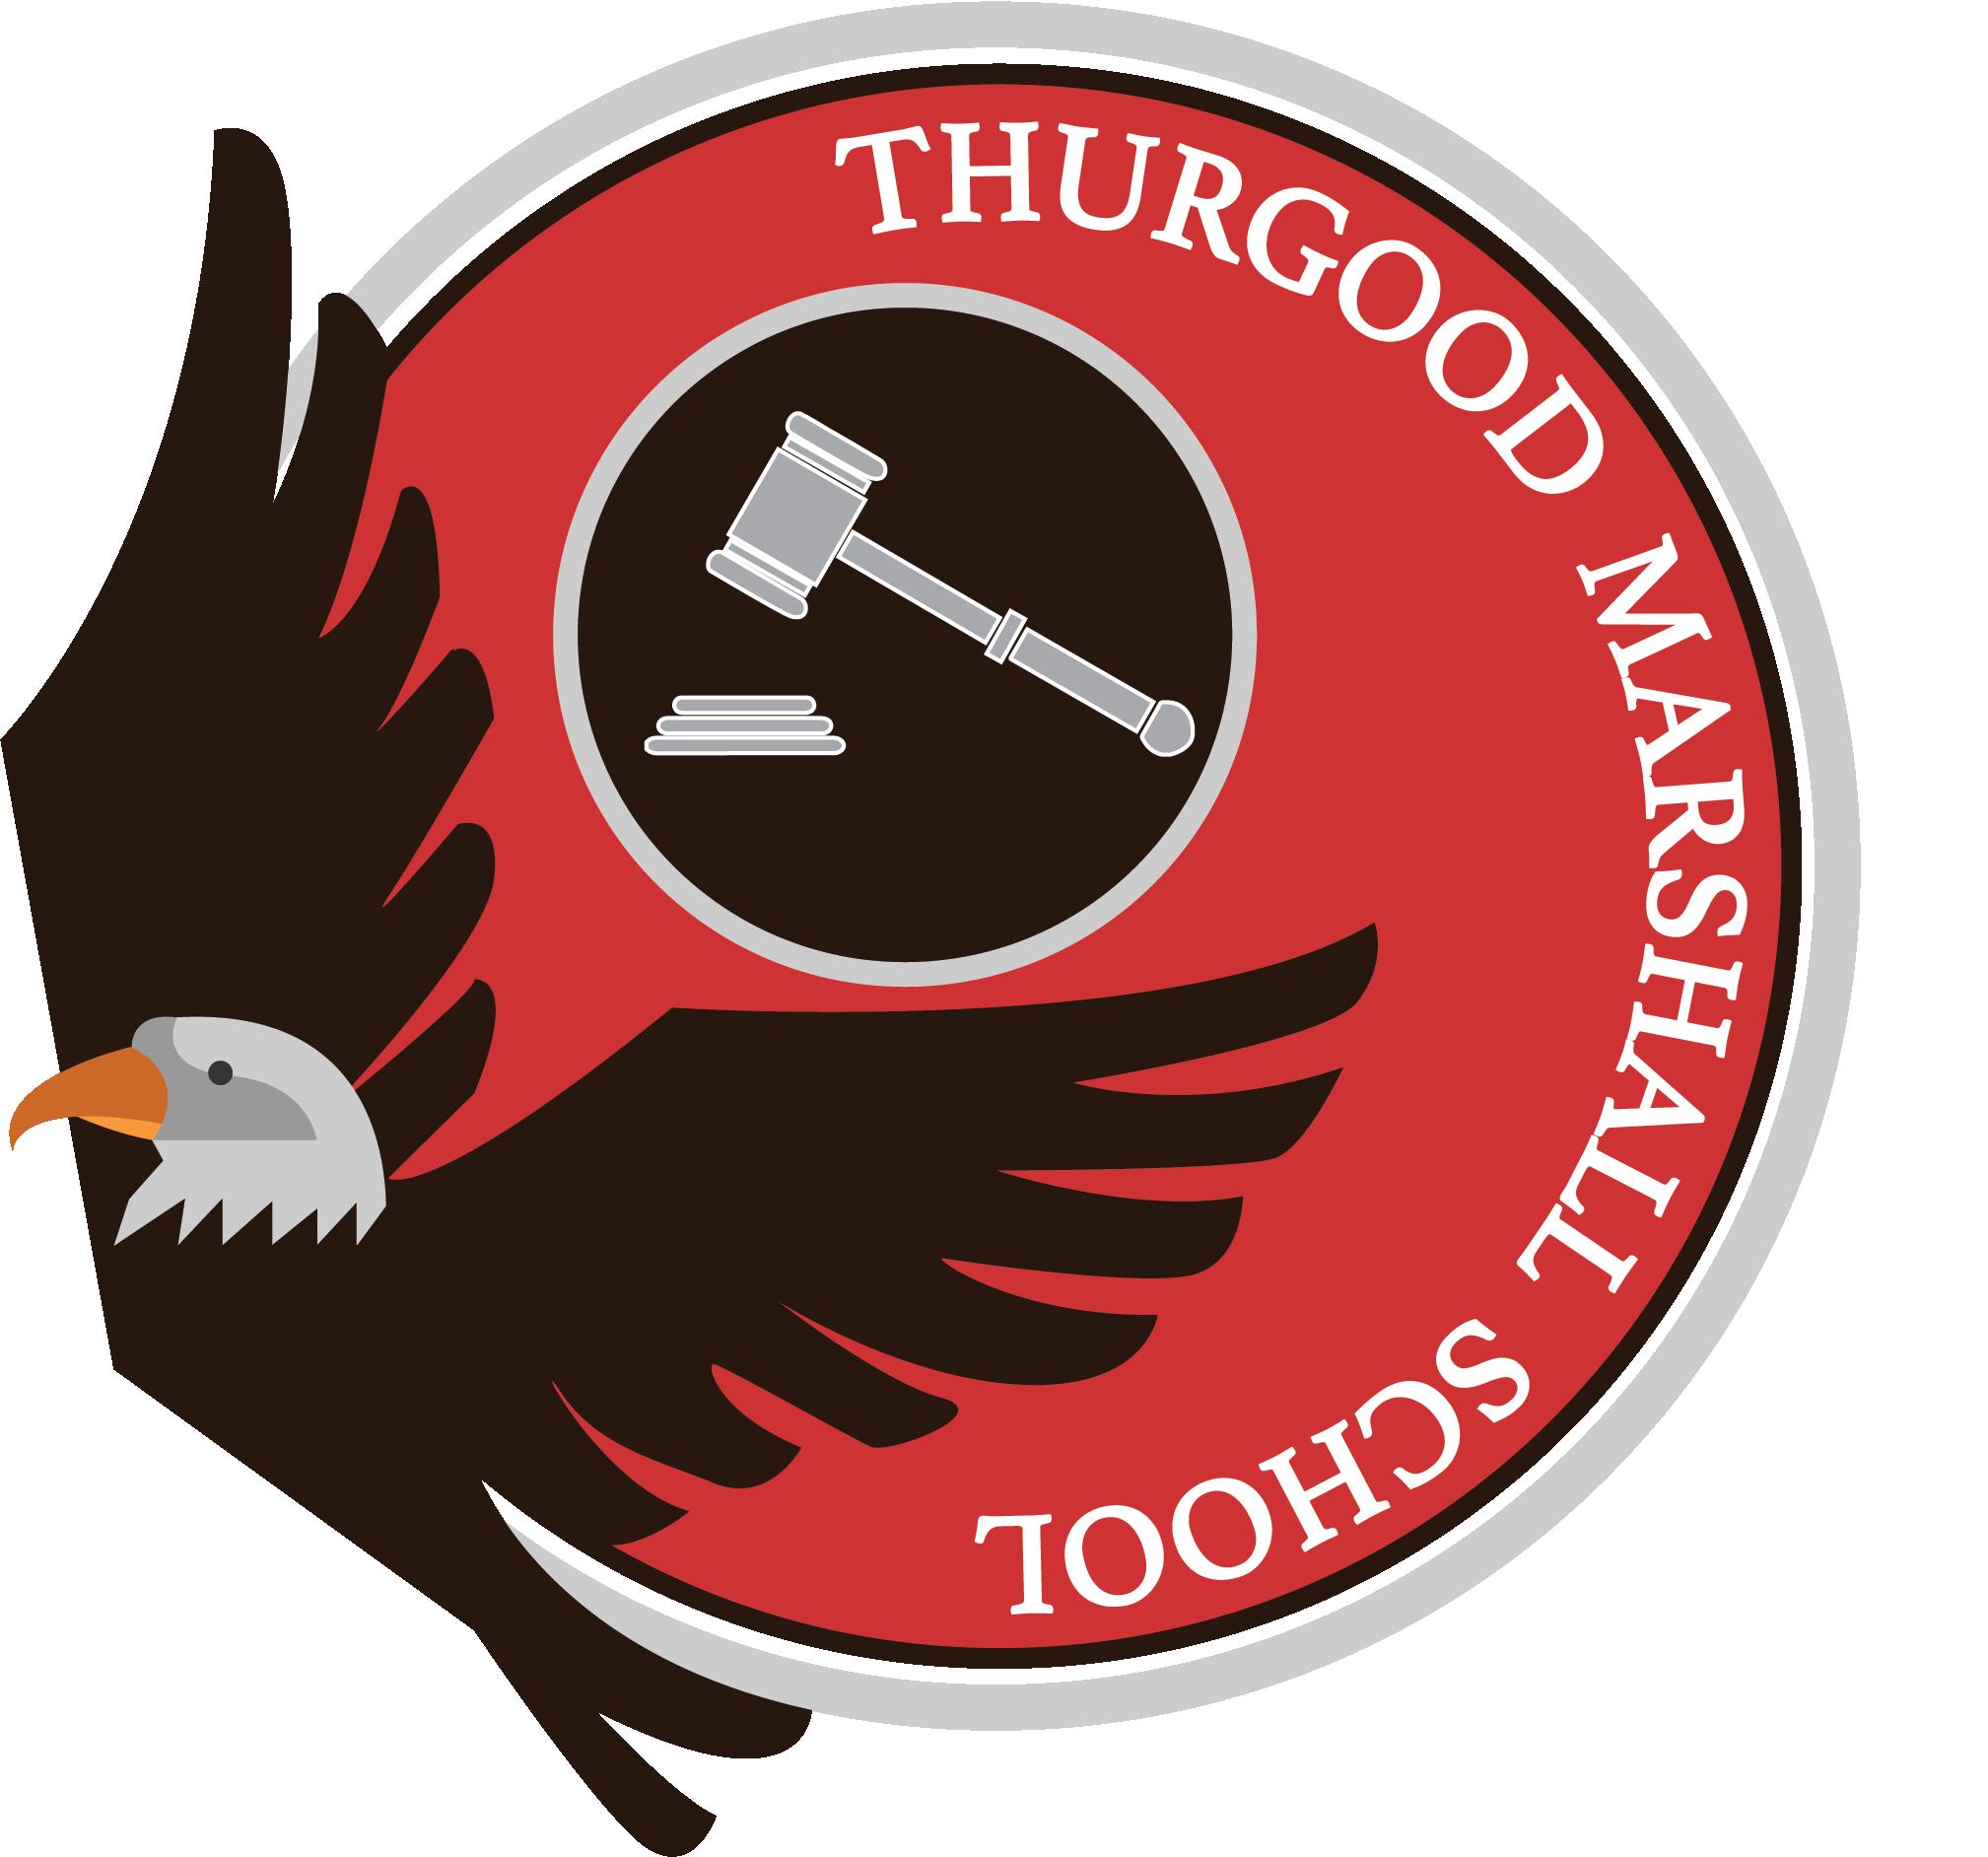 Thurgood_logo_redcircle.png